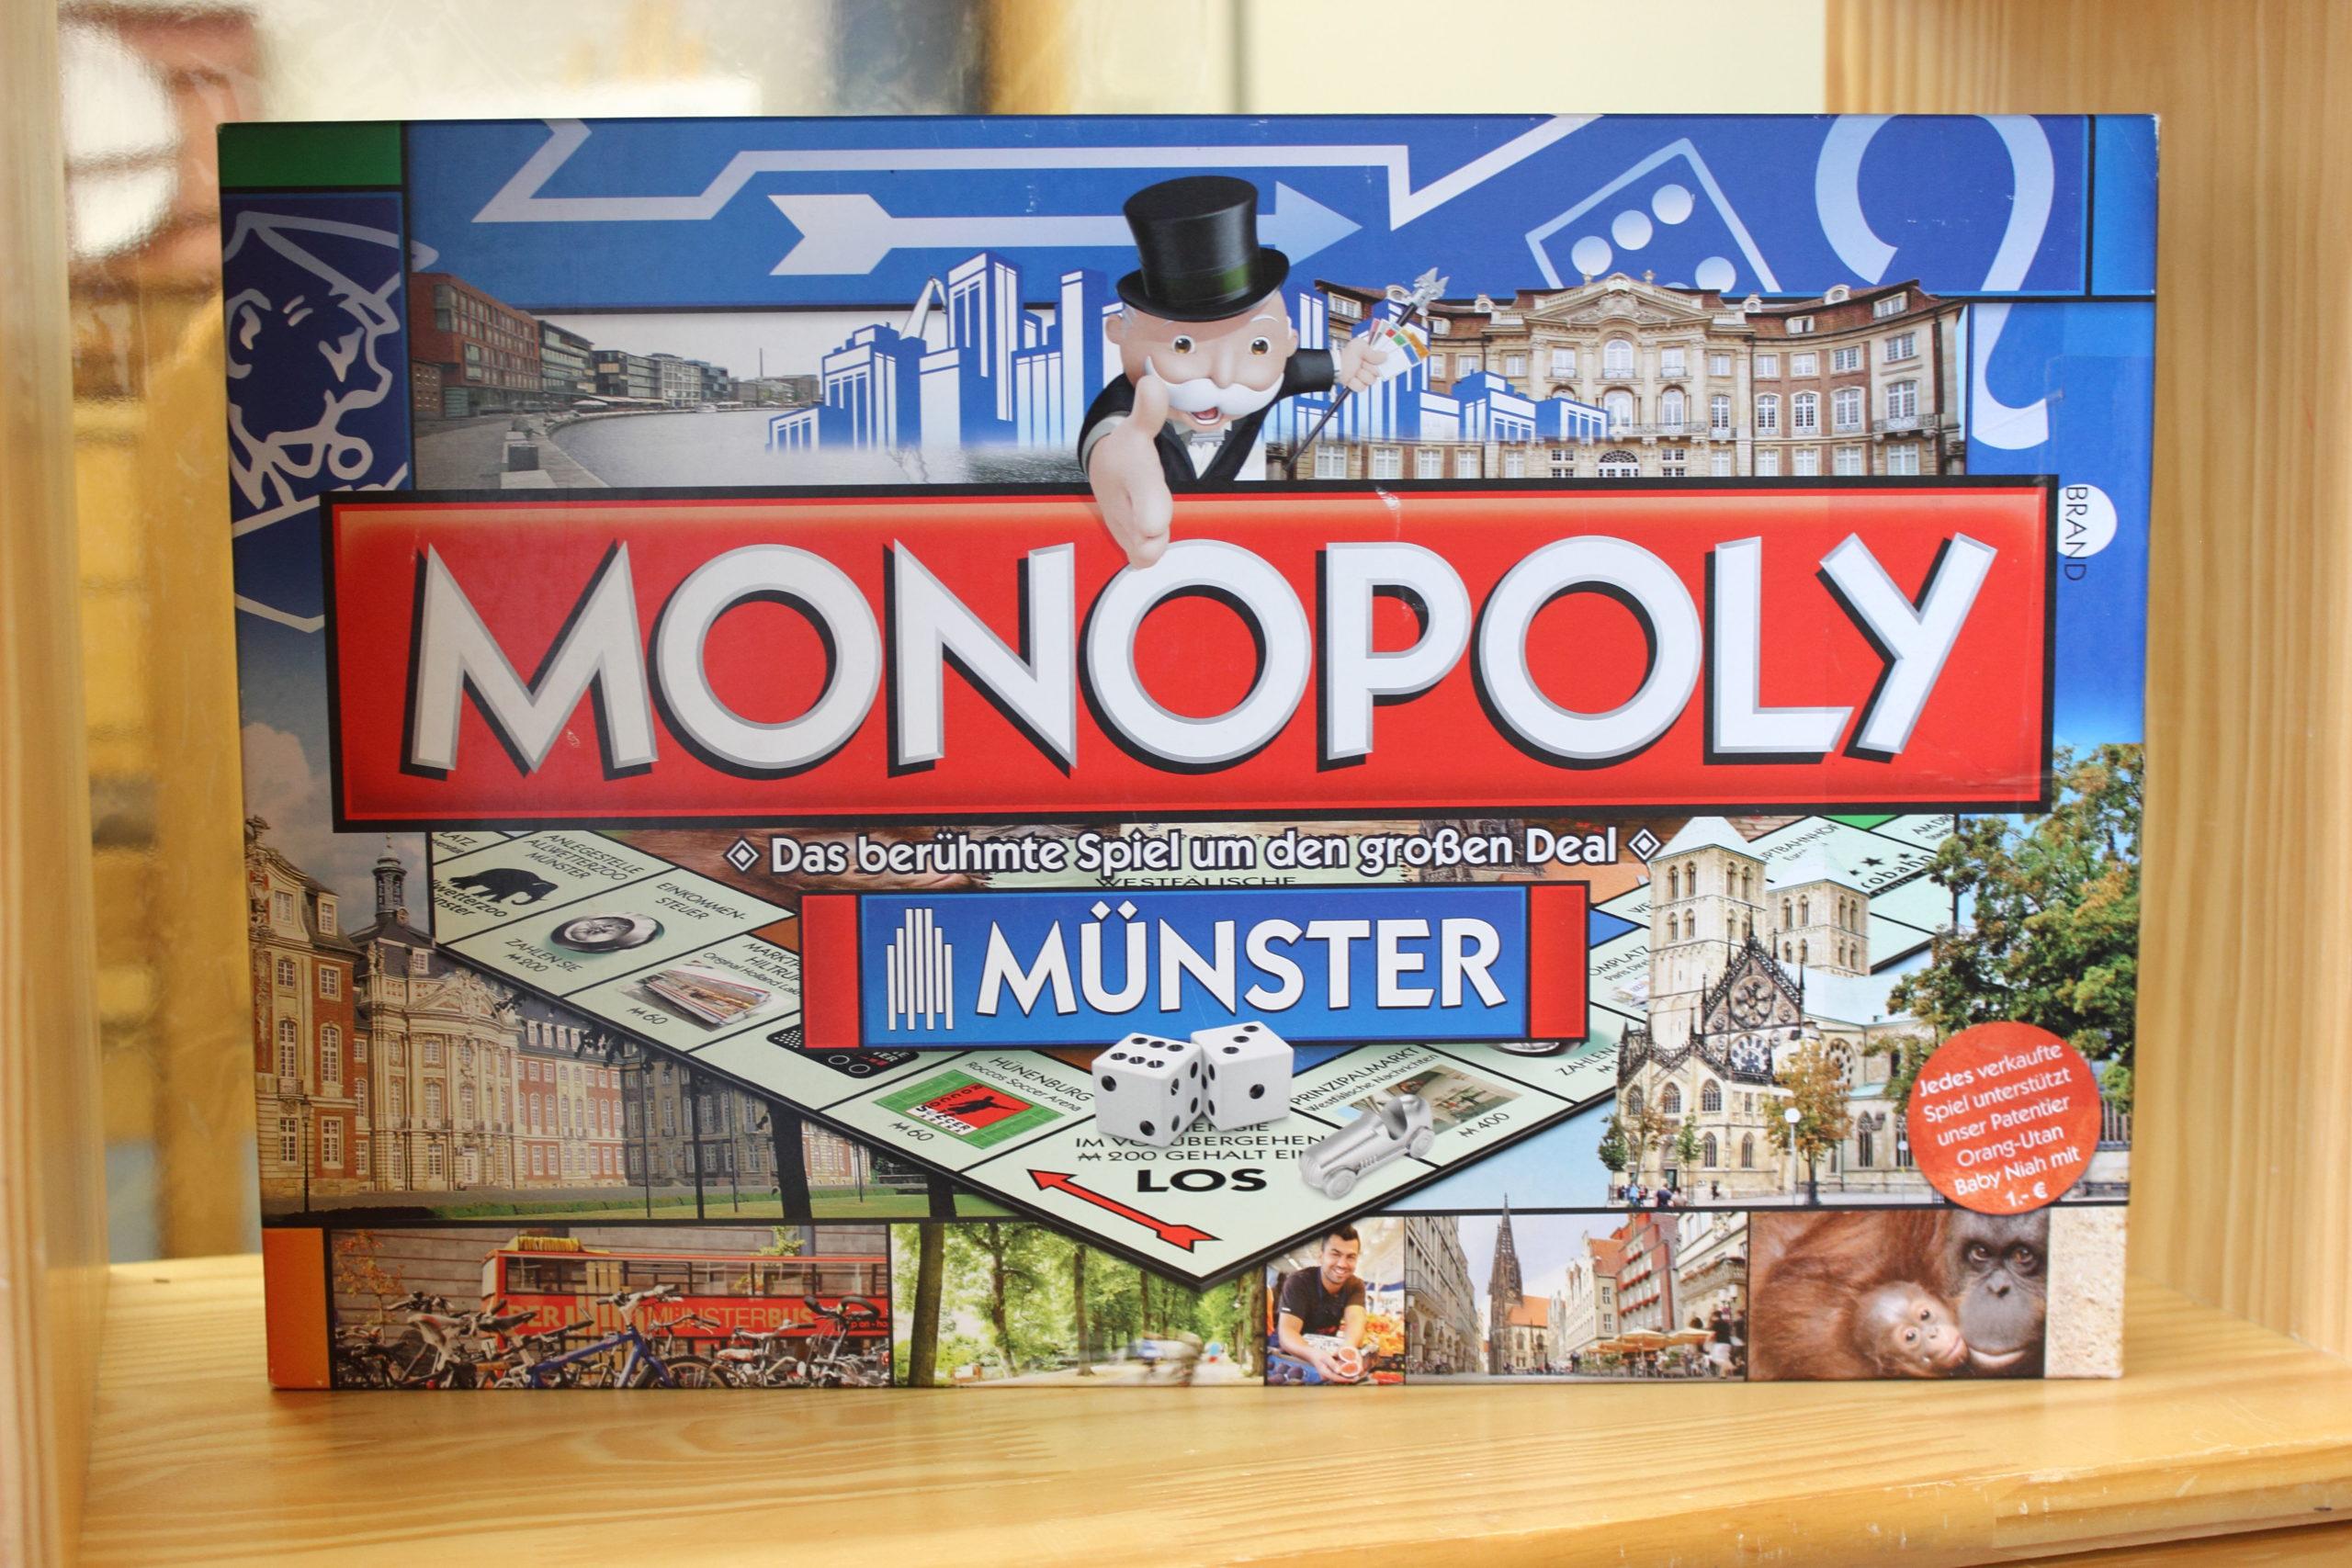 Leihothek Münster Monopoly